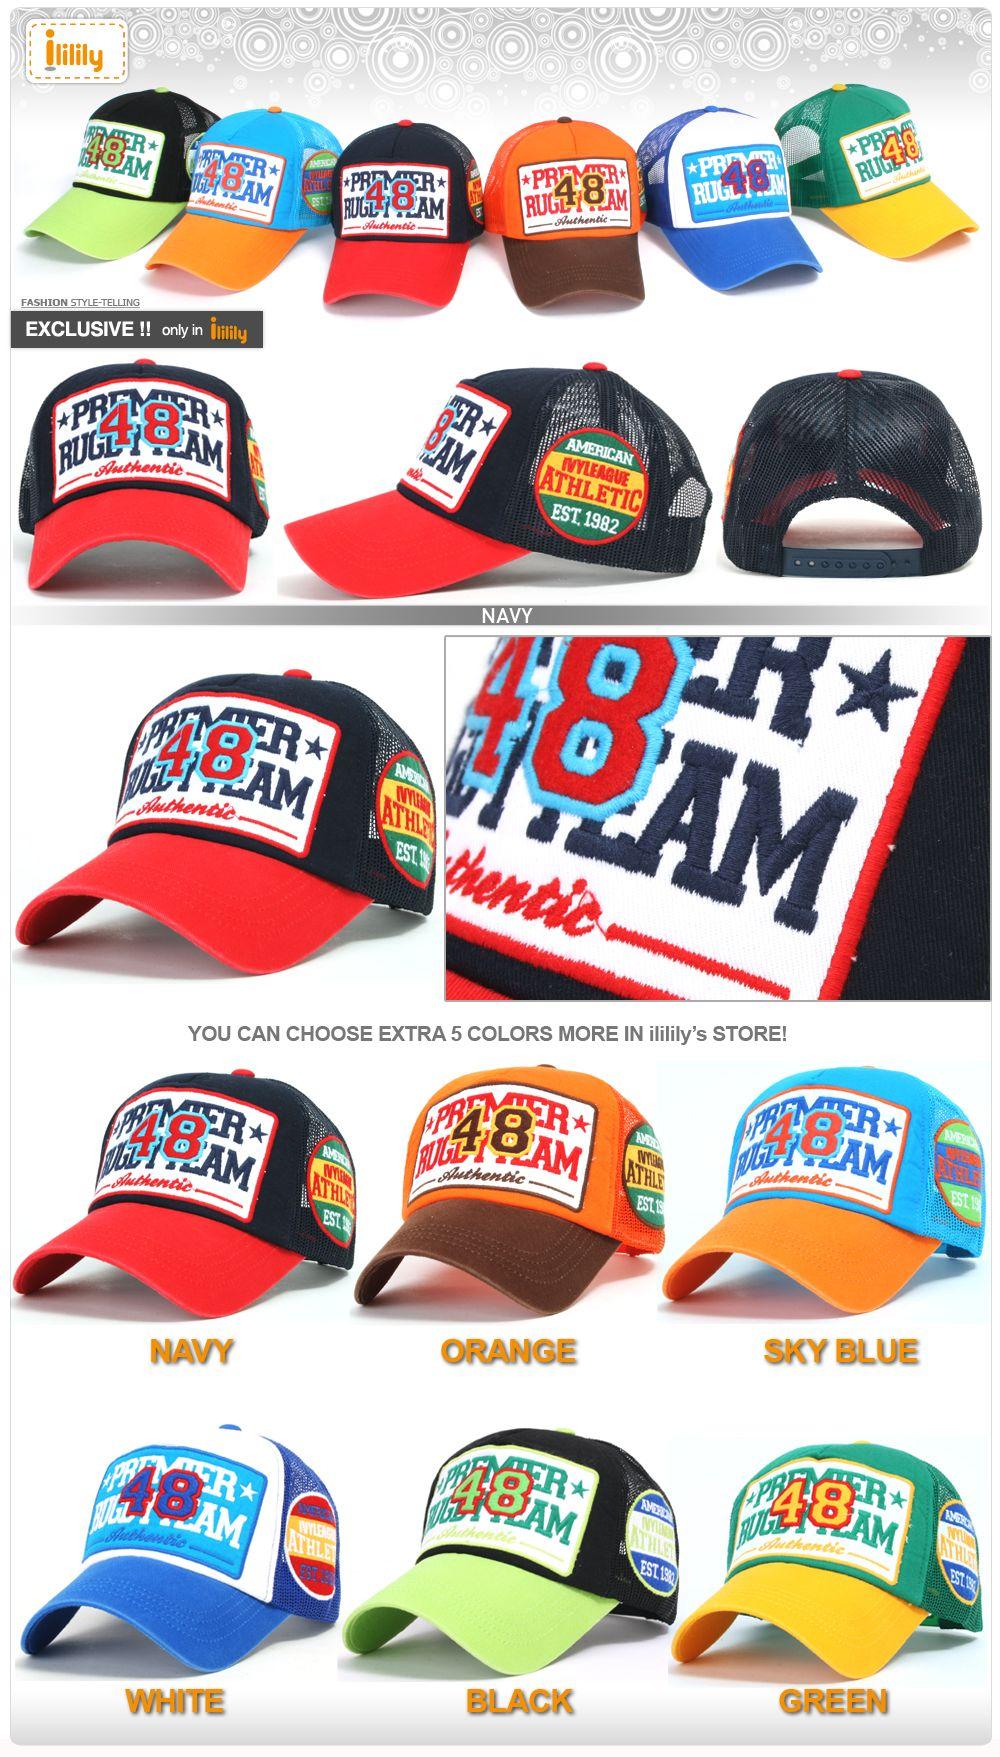 ded9aa74 distressed trucker hats | New Vintage Distressed Ball Cap Trucker Hat Sun  Visor | eBay